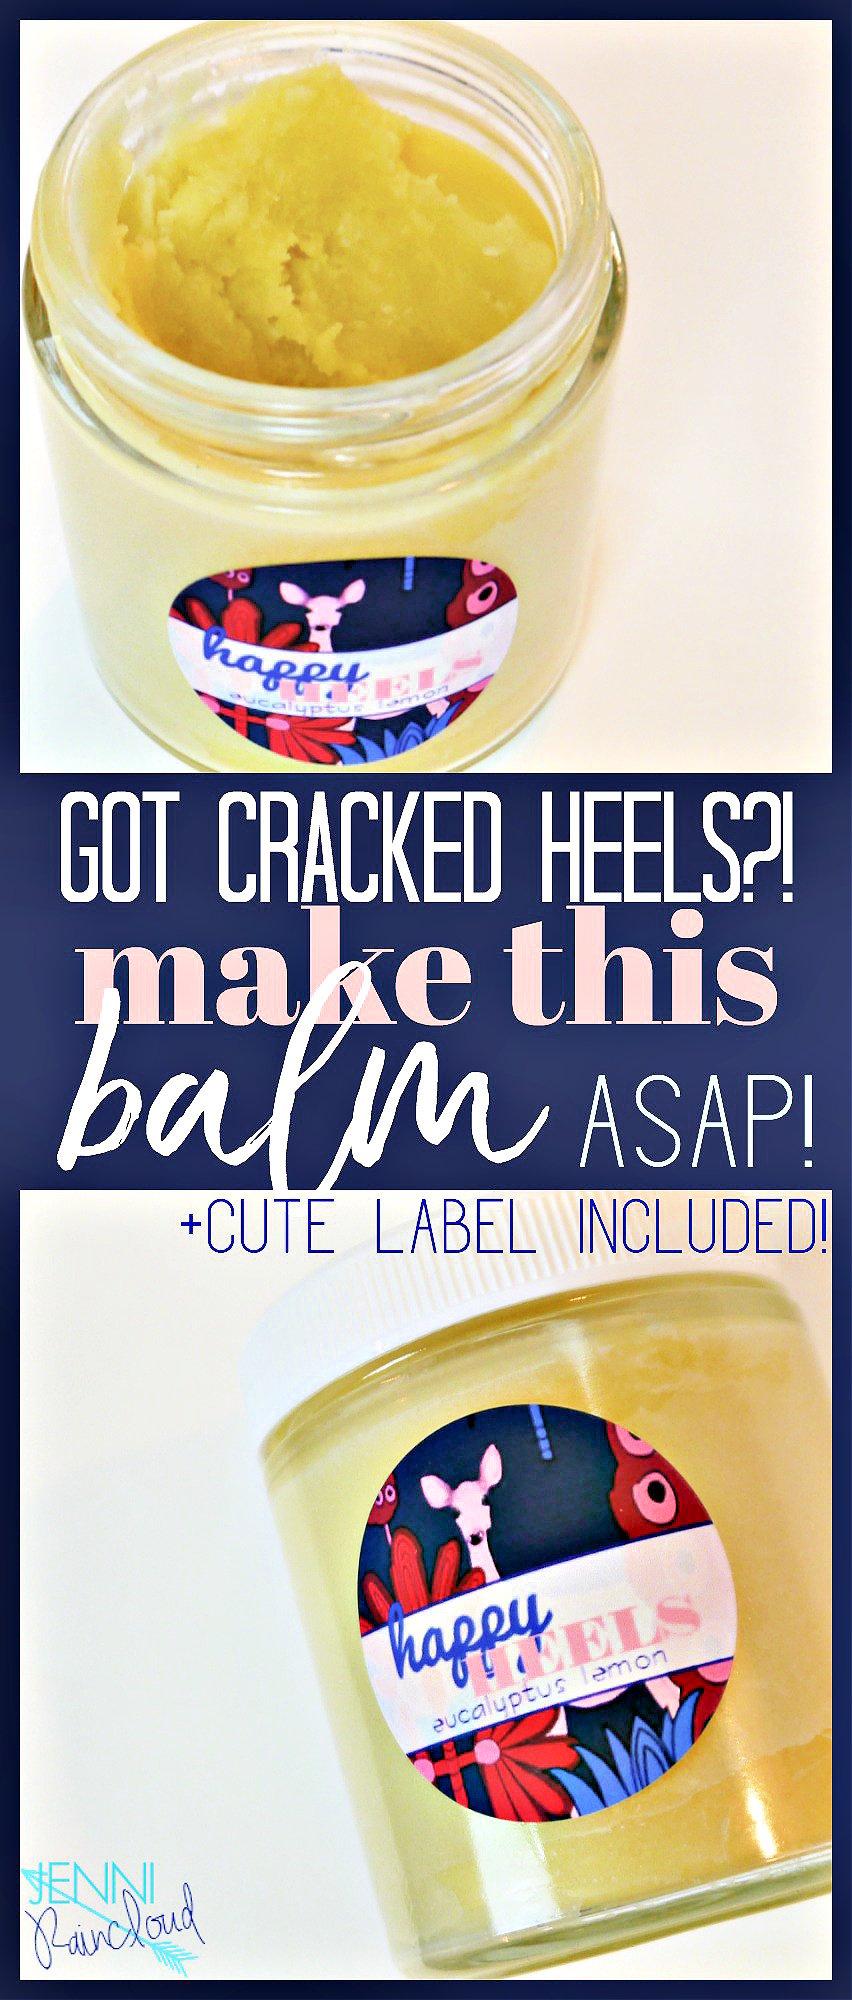 DIY Cracked Heel Balm Pinterest